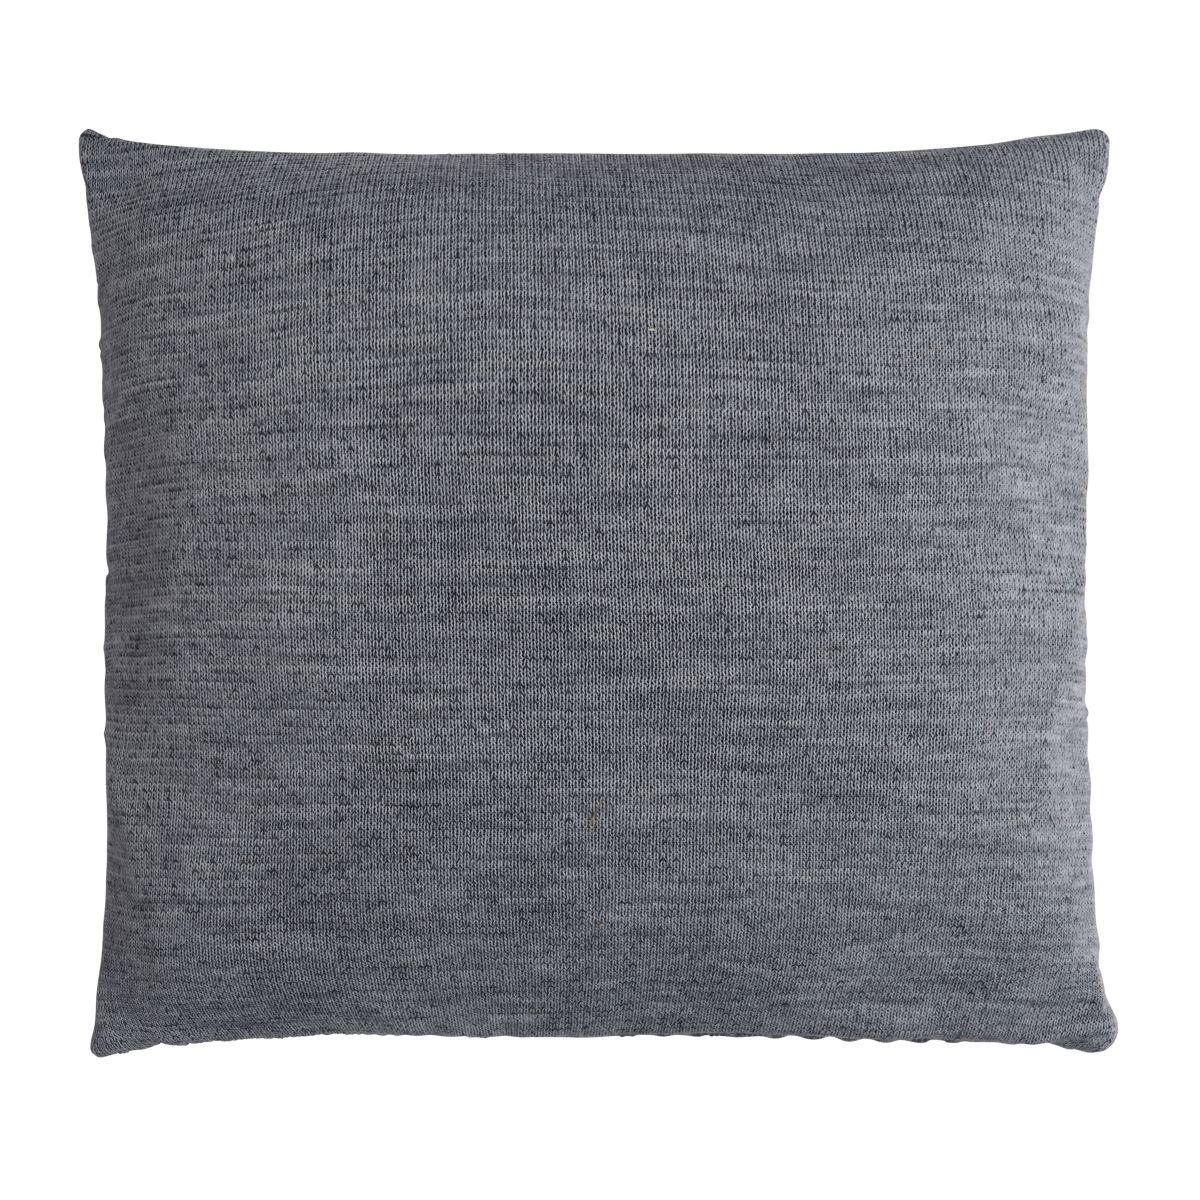 juul cushion anthracitelight grey 50x50